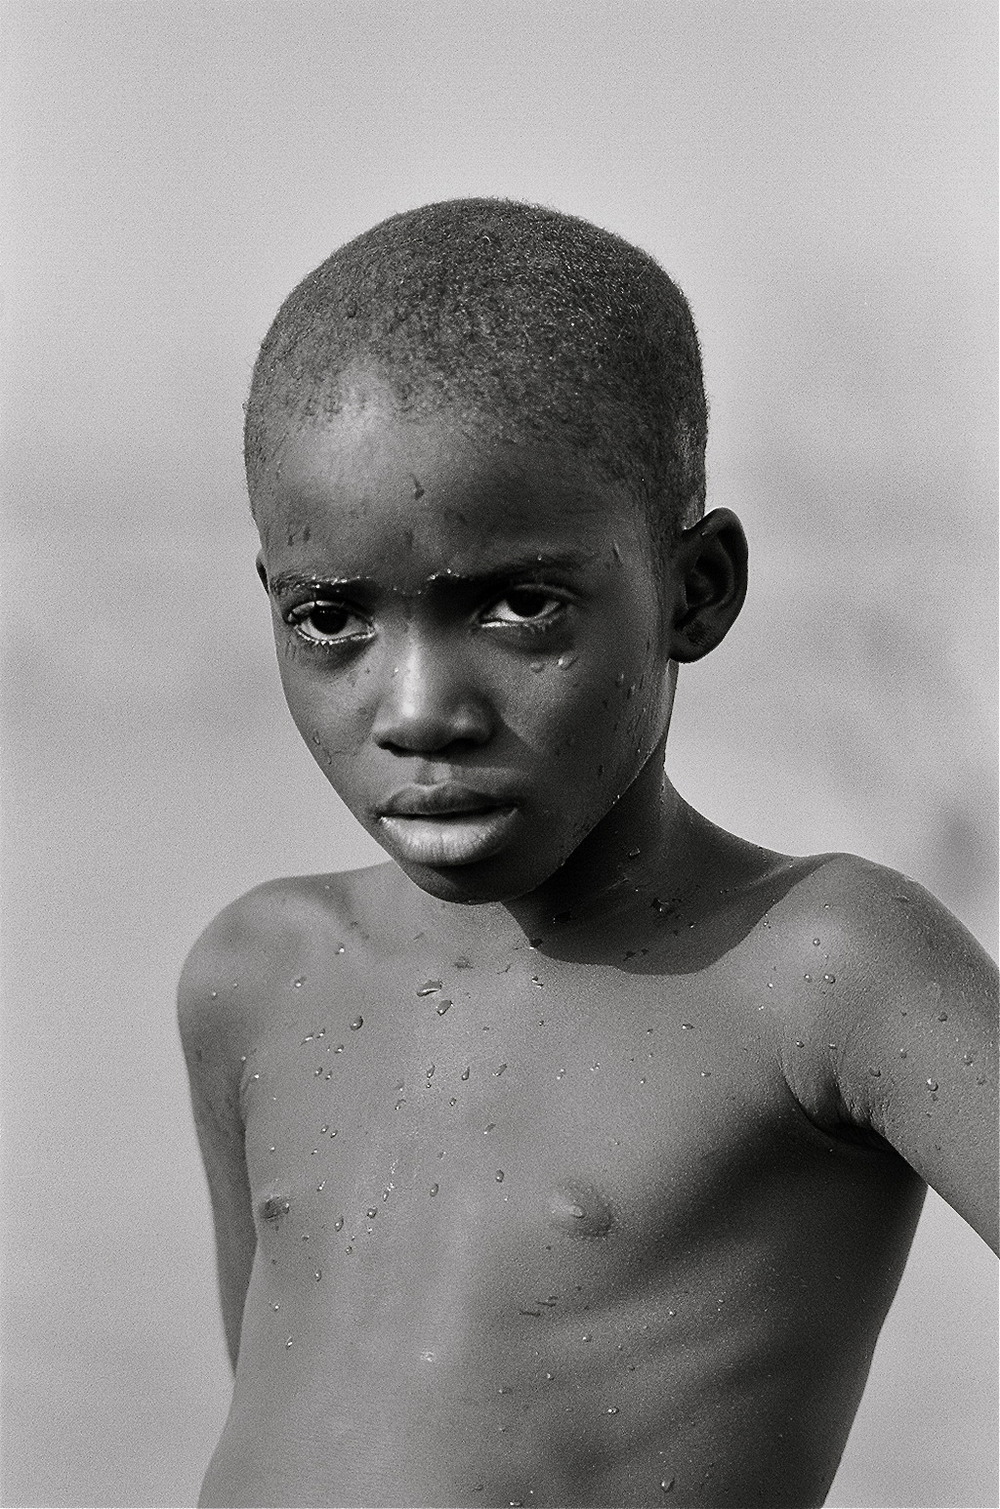 3. ghana-childslavery.jpg